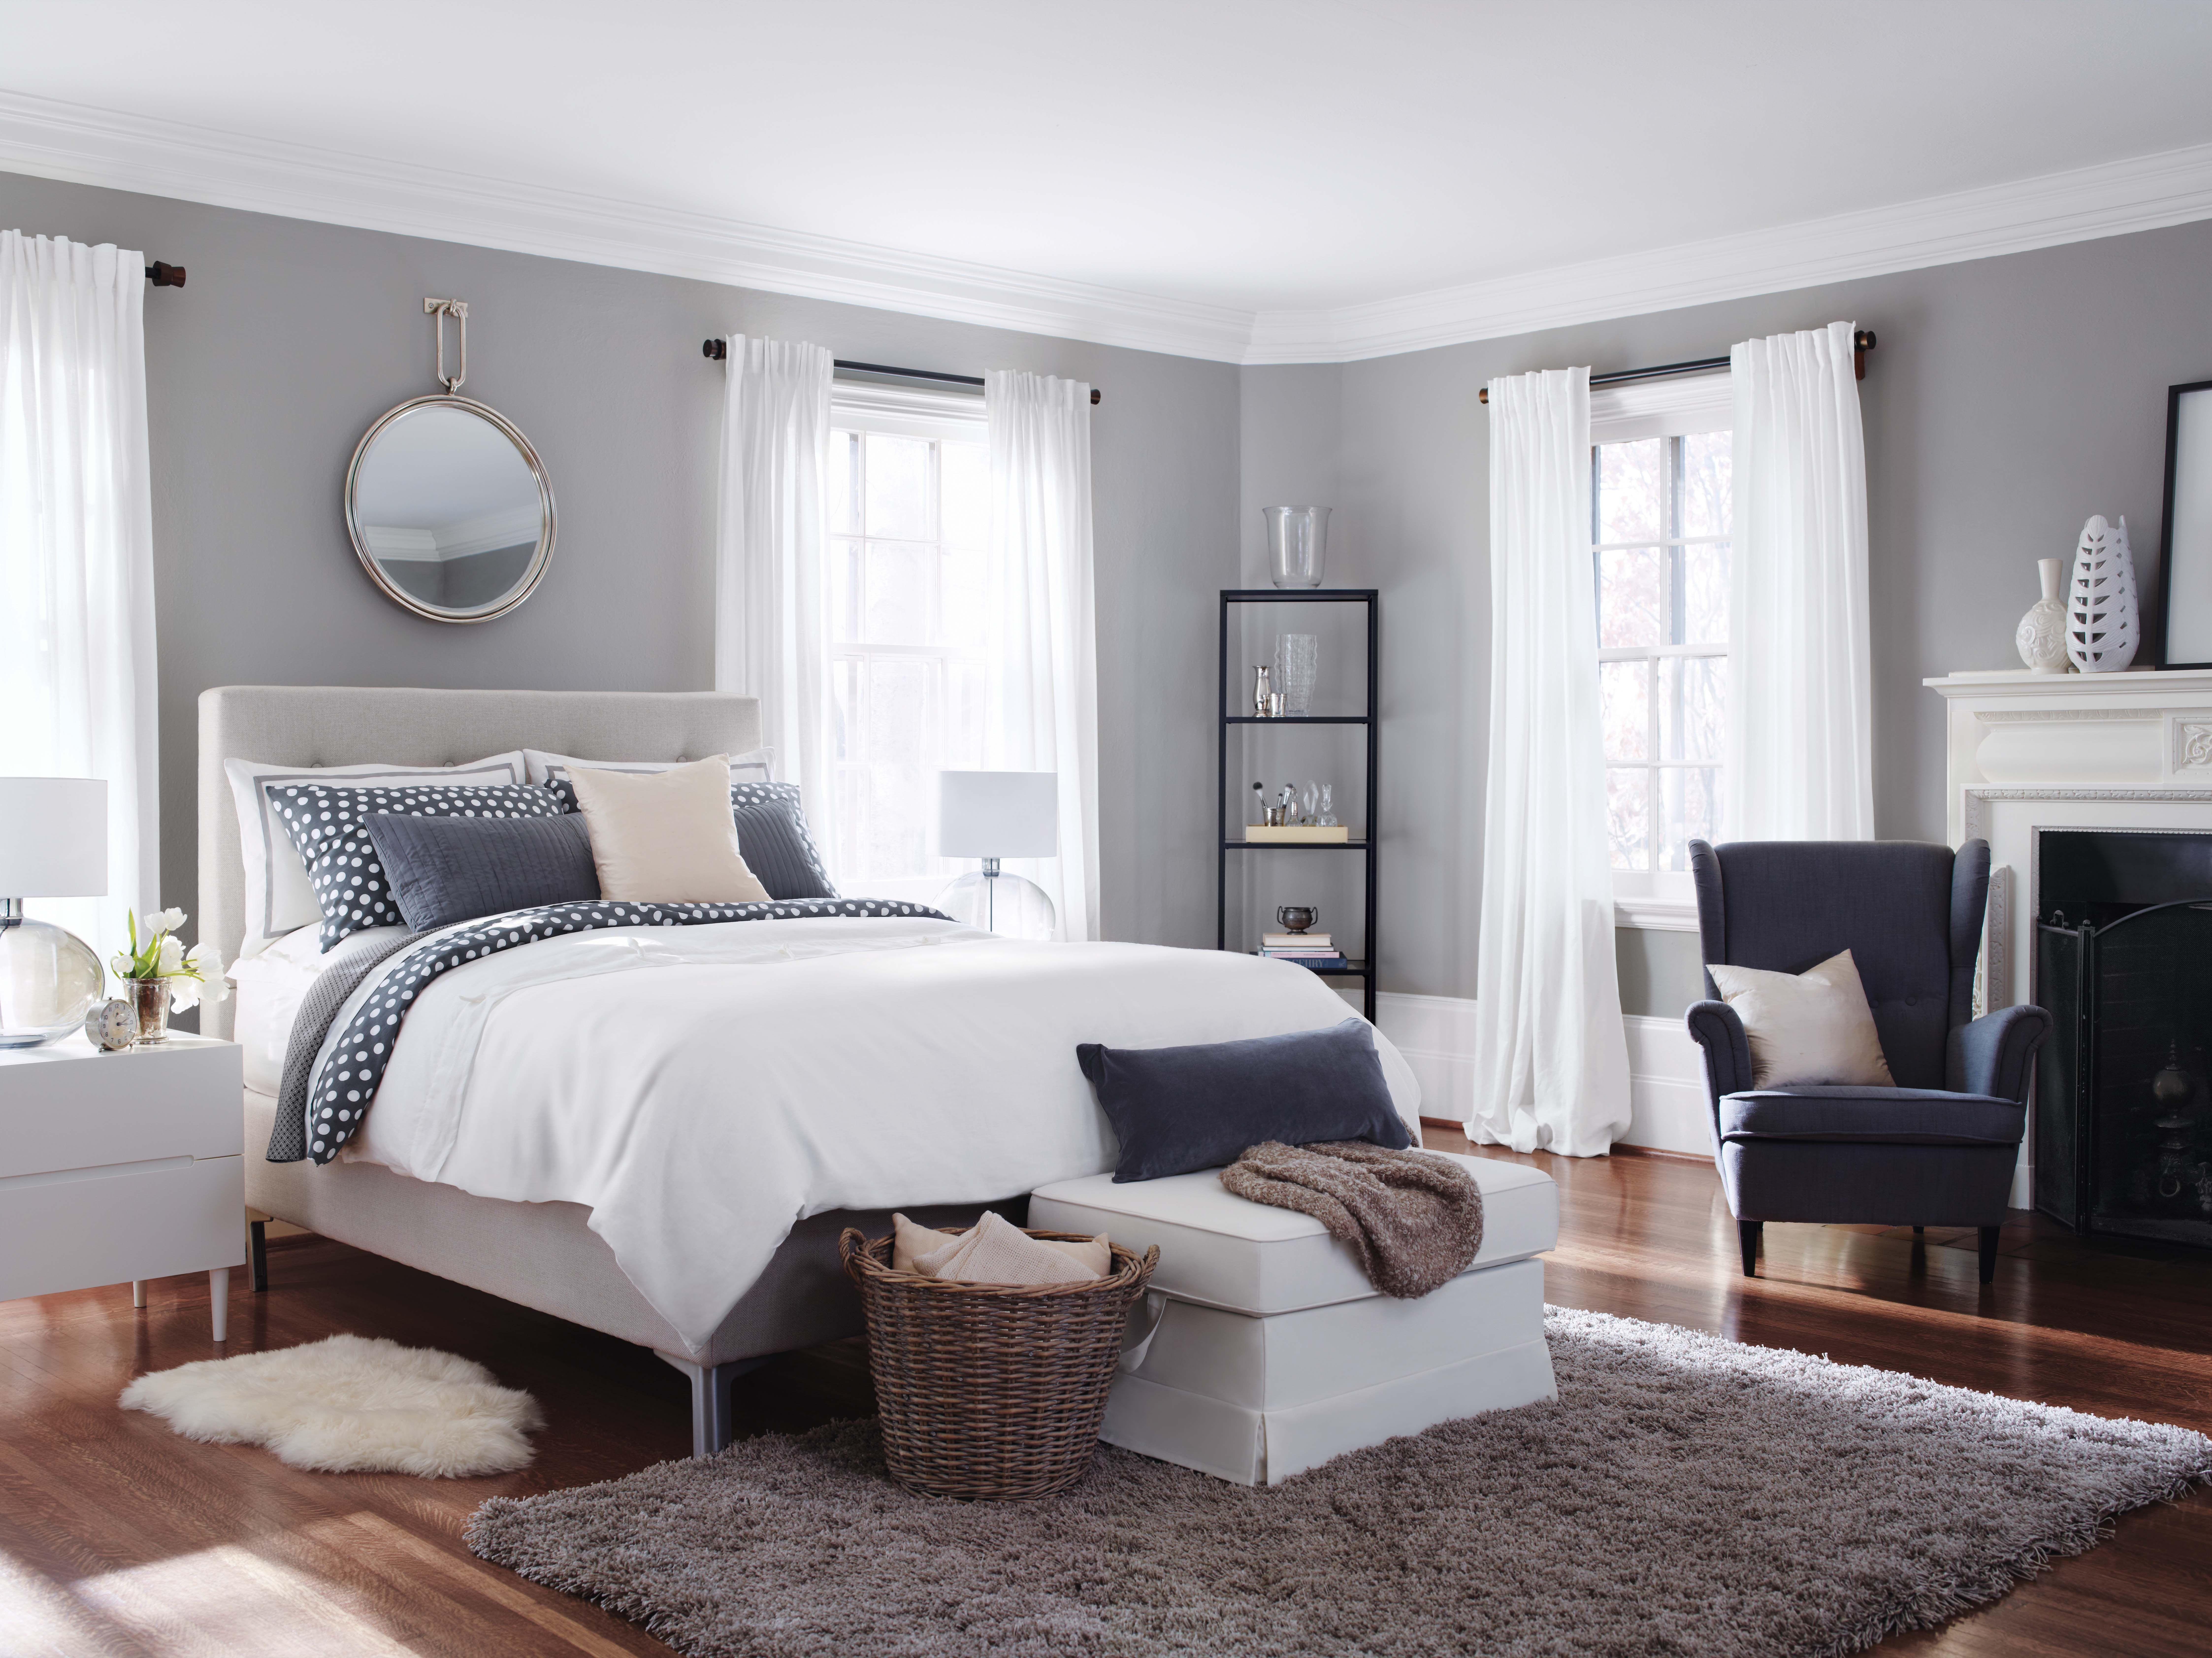 4 Great Mattresses For A Good Night 39 S Sleep Bedroom Inspiration Bedroom Decor Ikea Bedroom